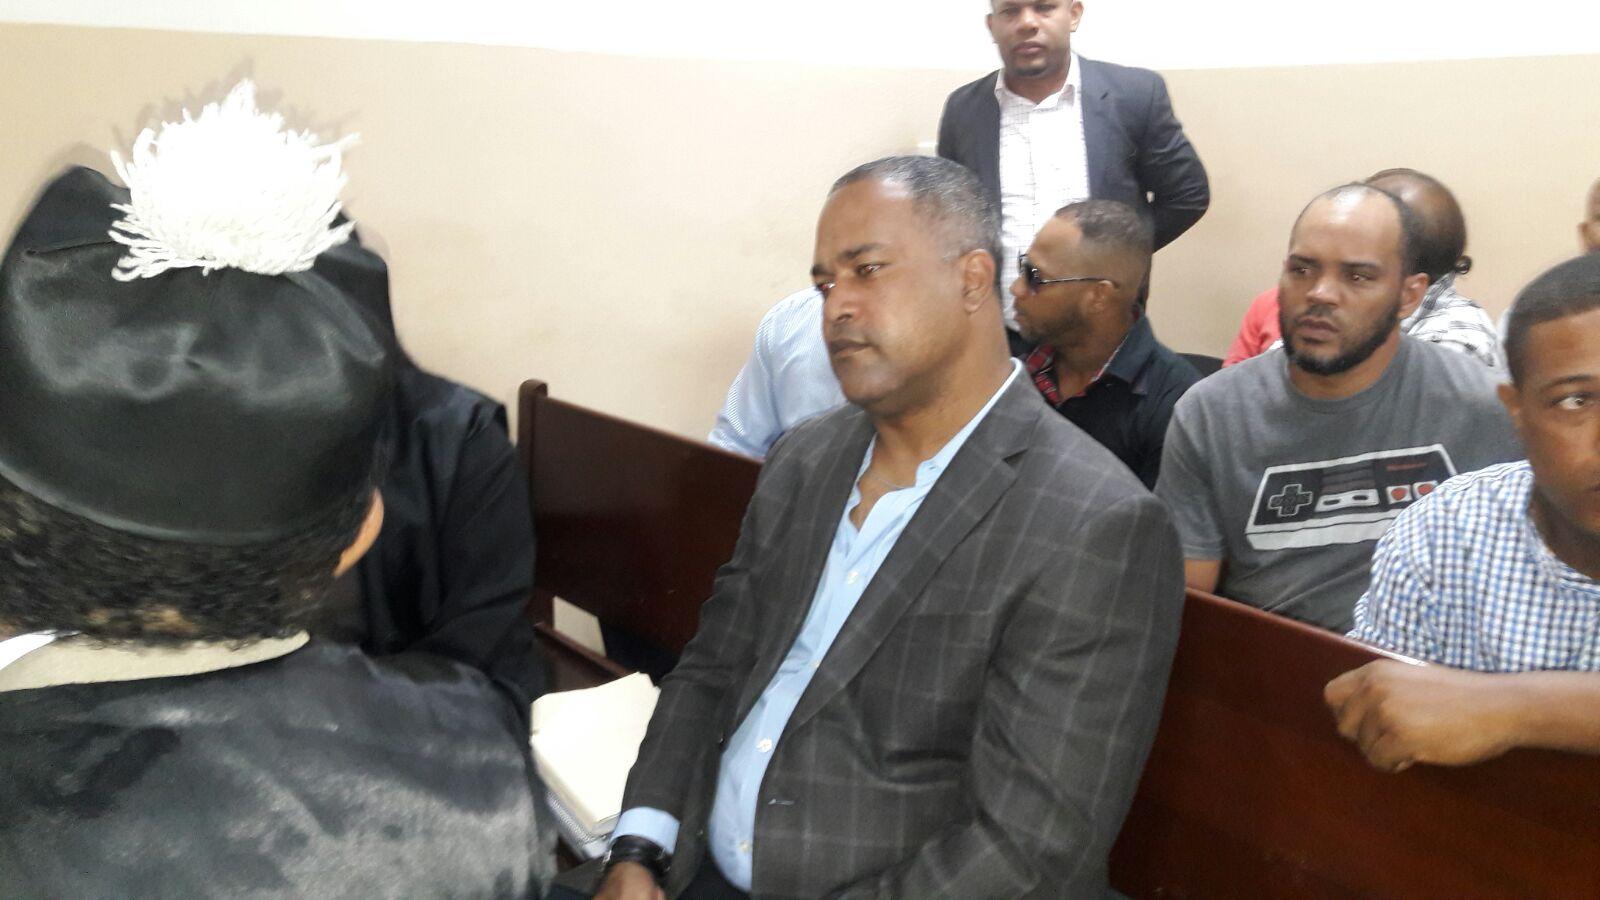 MP solicitará varíen prisión domiciliaria por prisión preventiva a exalcalde de San Cristóbal